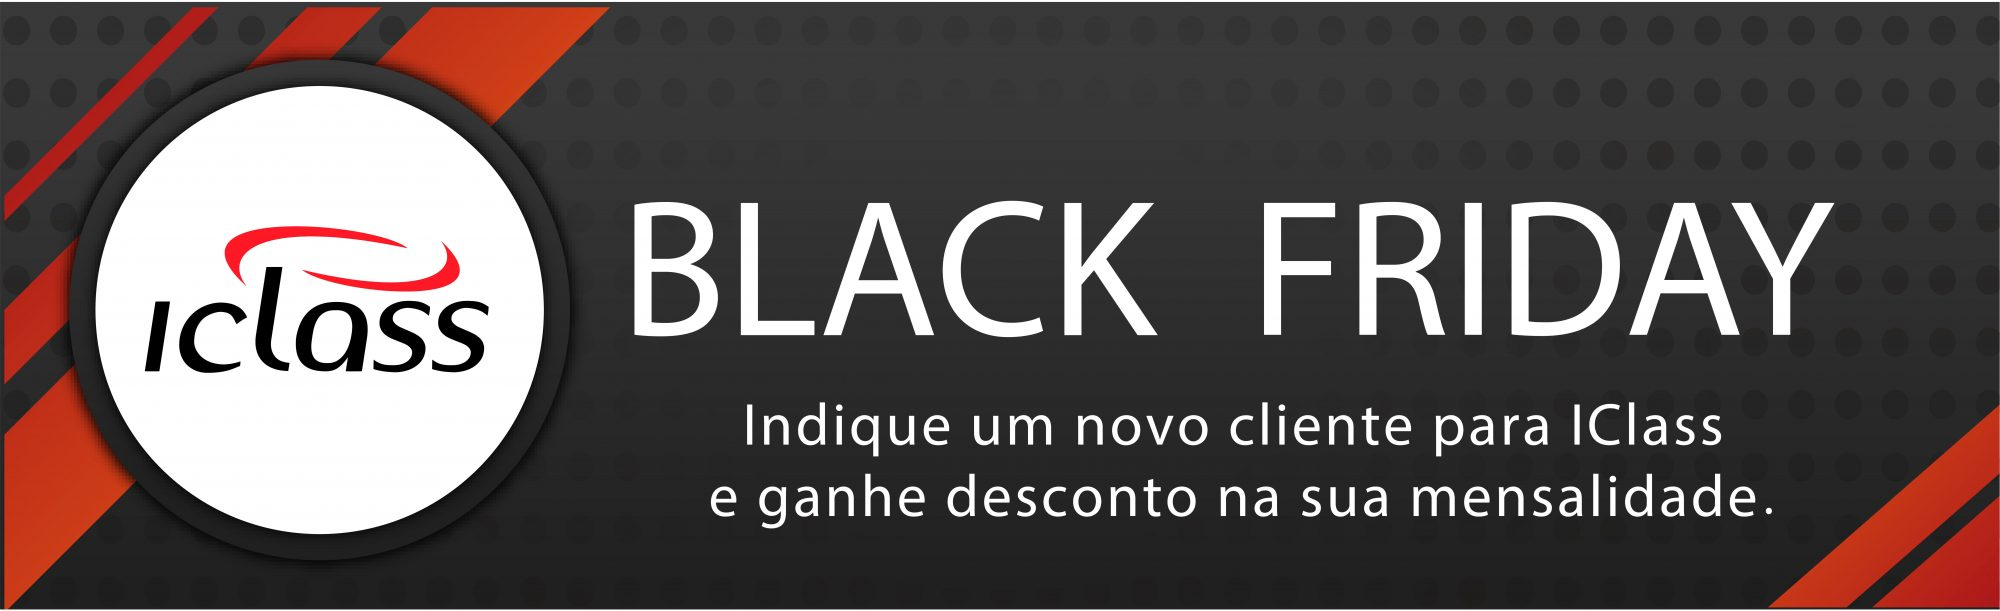 Black Friday IClass 2018 banner Black Friday IClass 2018 banner